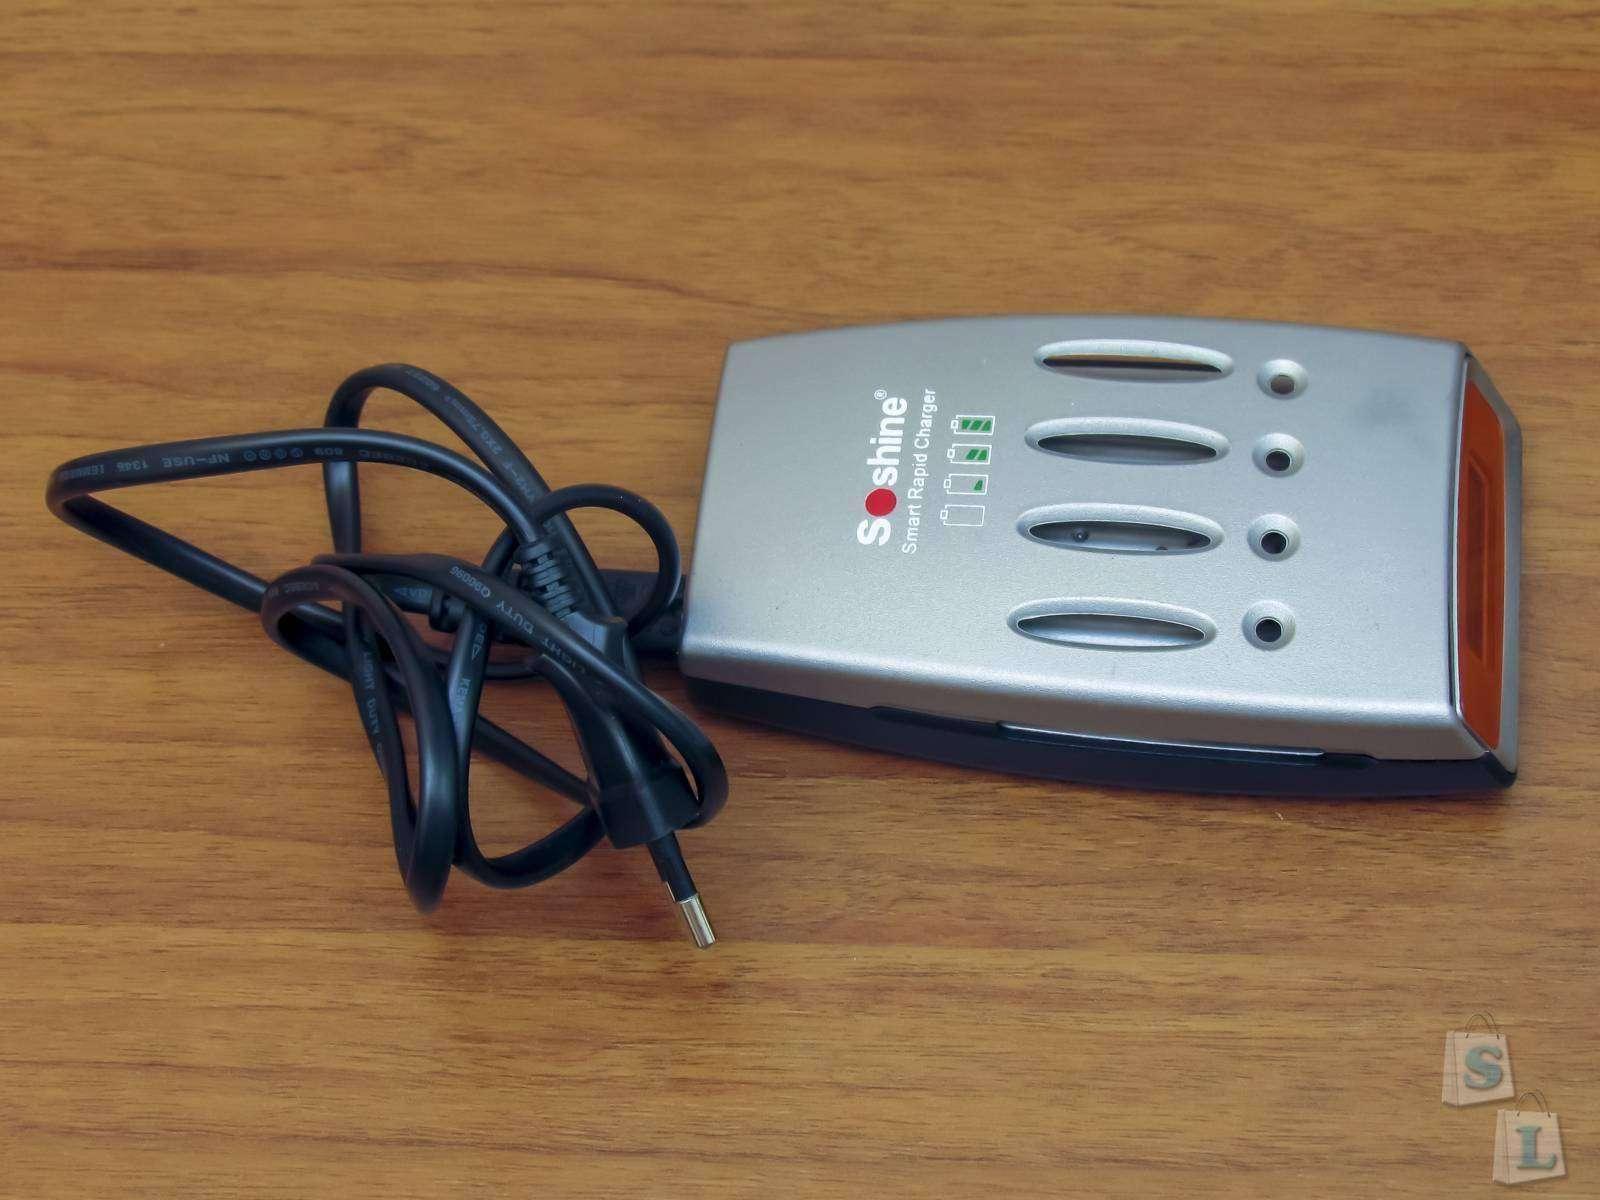 DealExtreme: Быстрая зарядка для NiMh NiCd аккумуляторов Soshine Hi-Tech LCD NiMH / NiCD Super Quick Charger